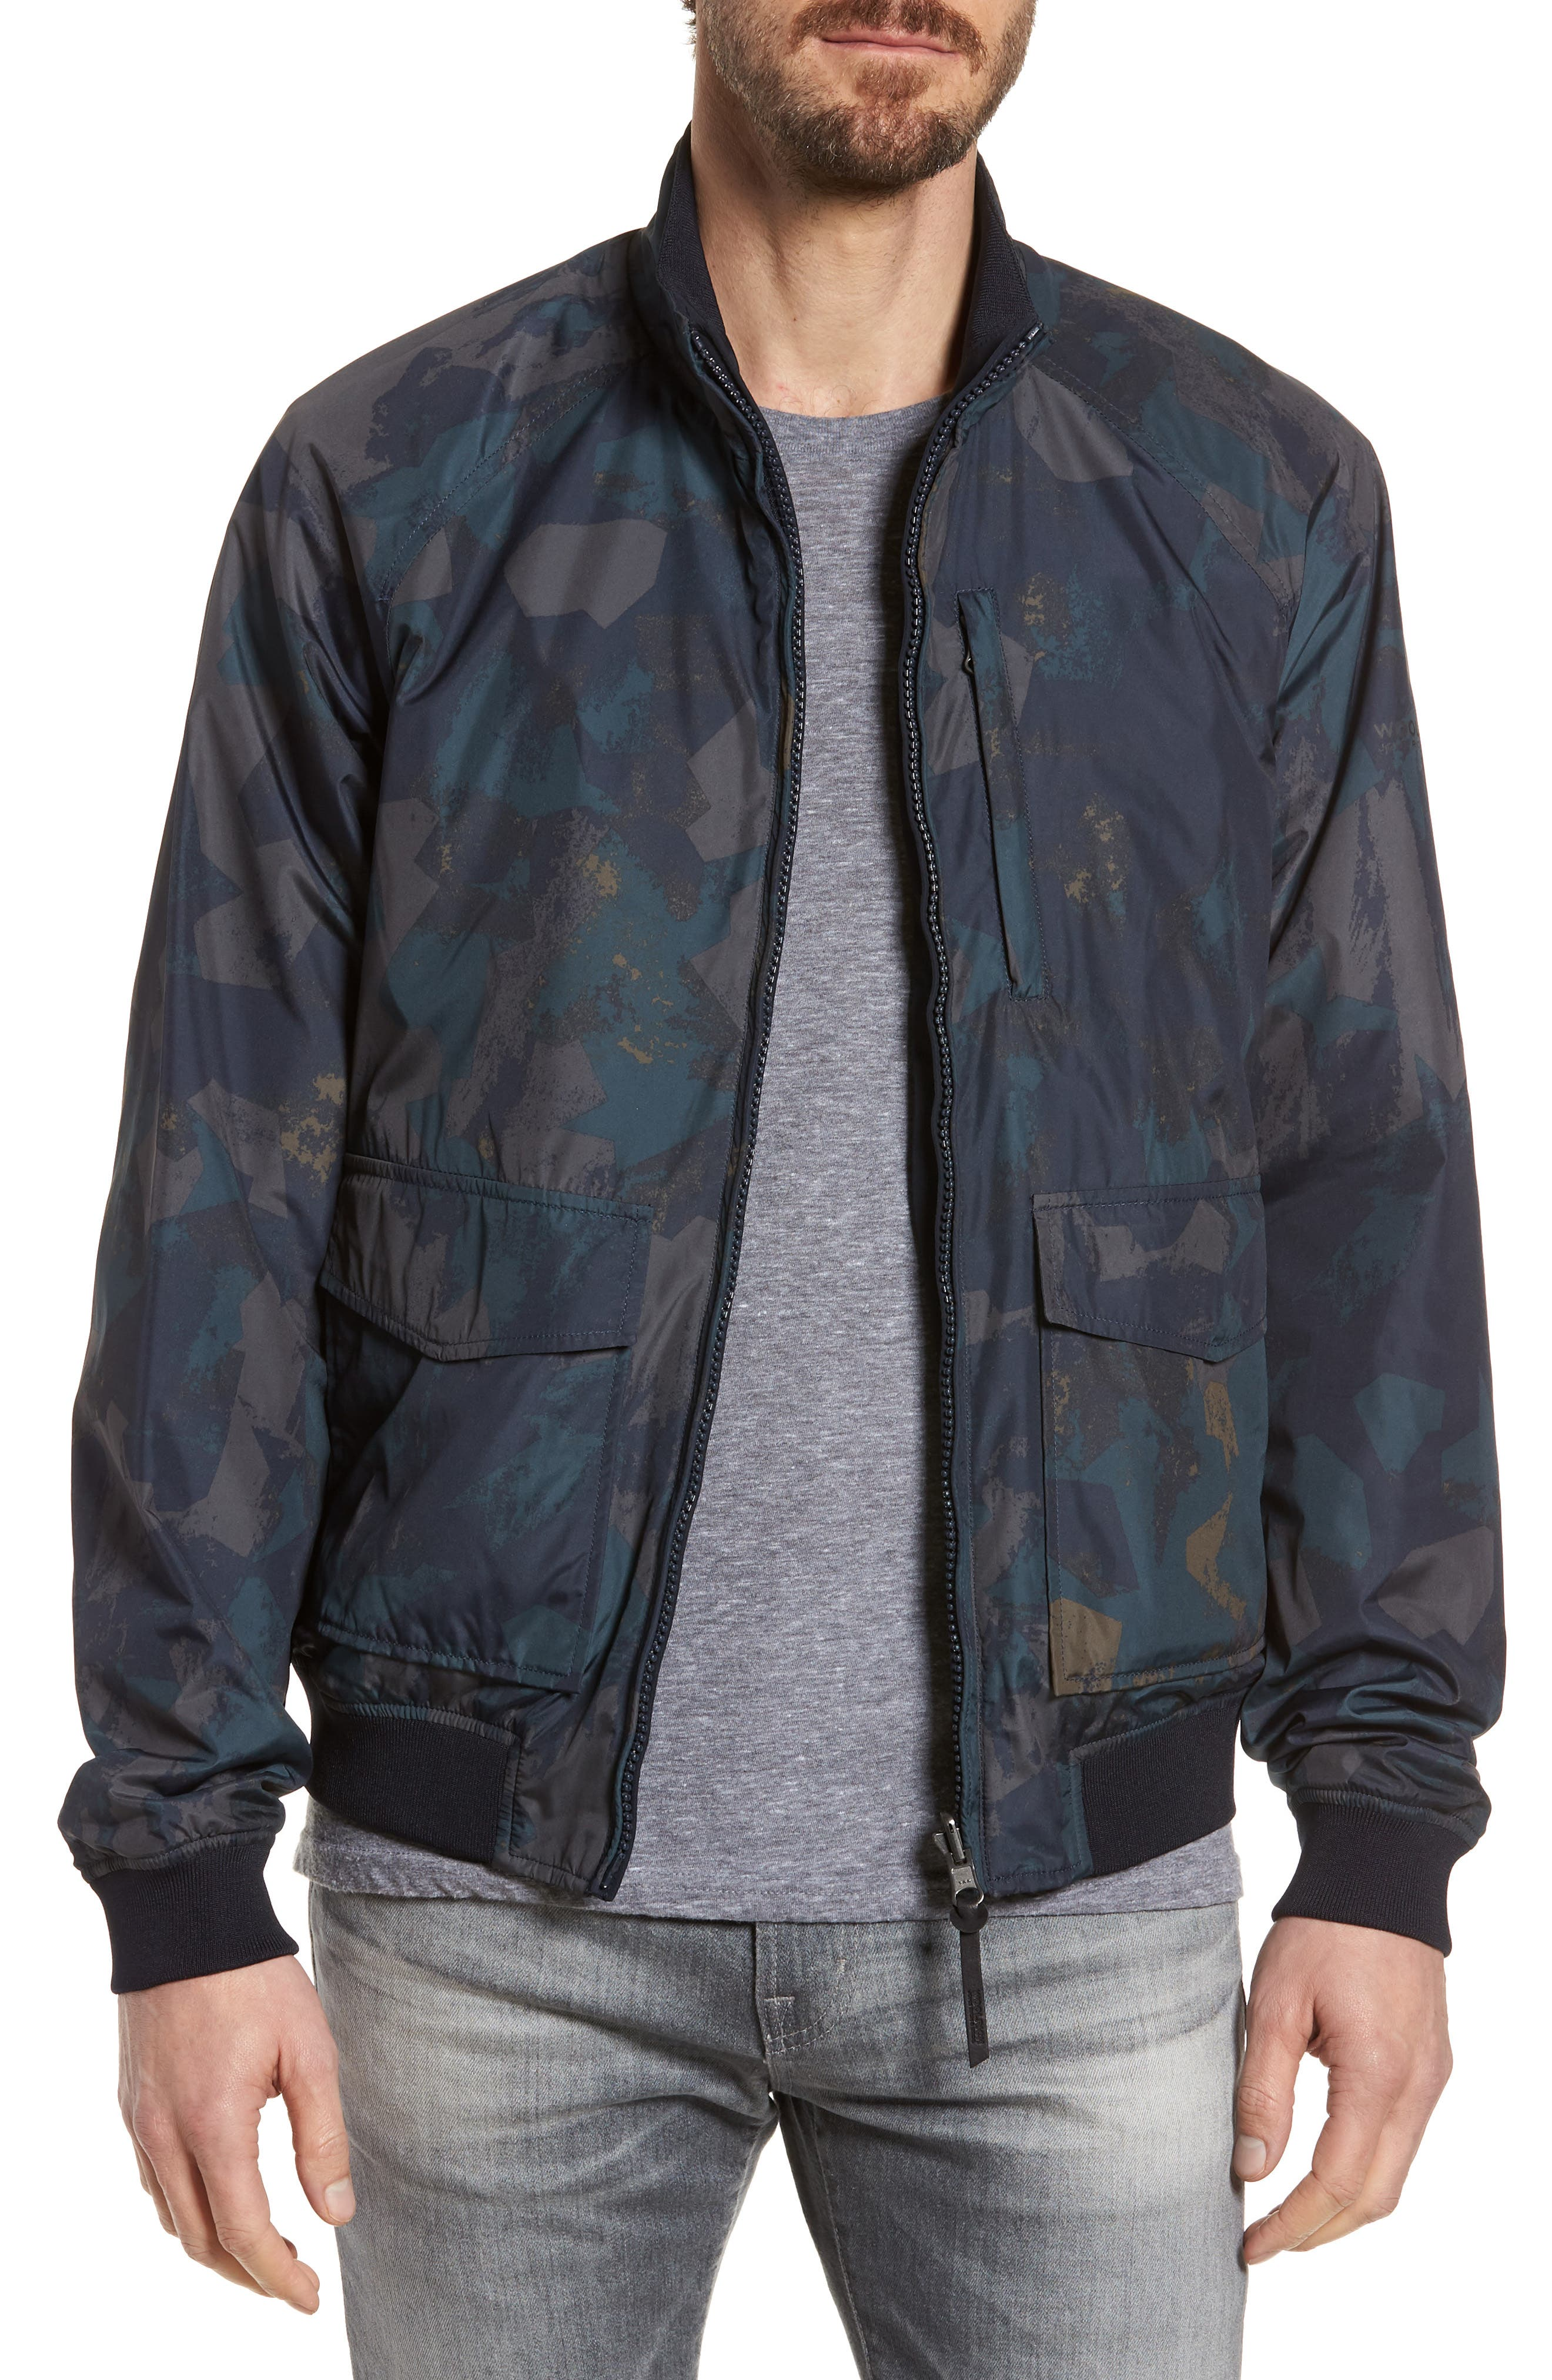 & Bros. Shore Reversible Bomber Jacket,                         Main,                         color, Melton Blue Camo